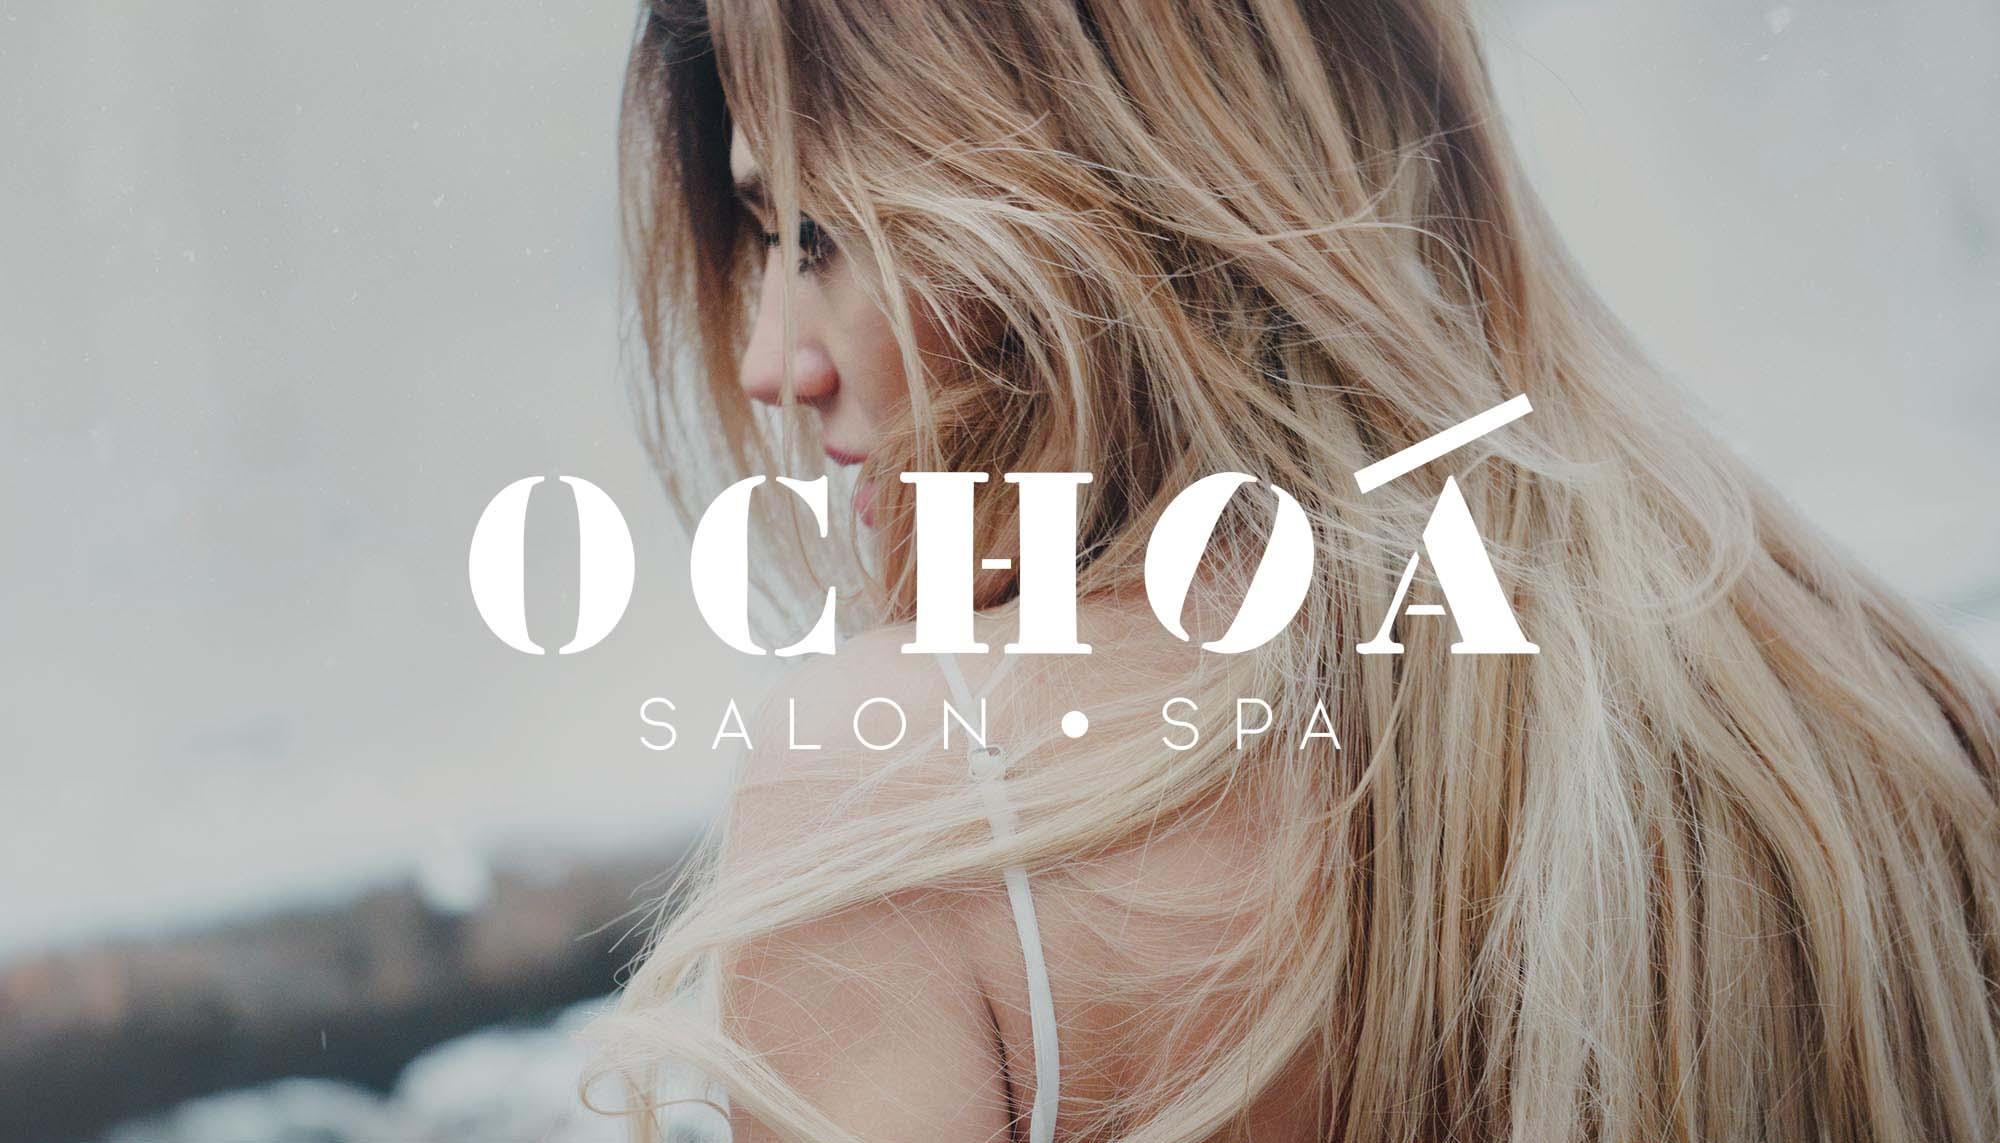 Ochoa Salon Spa East Longmeadow South Hadley Ma